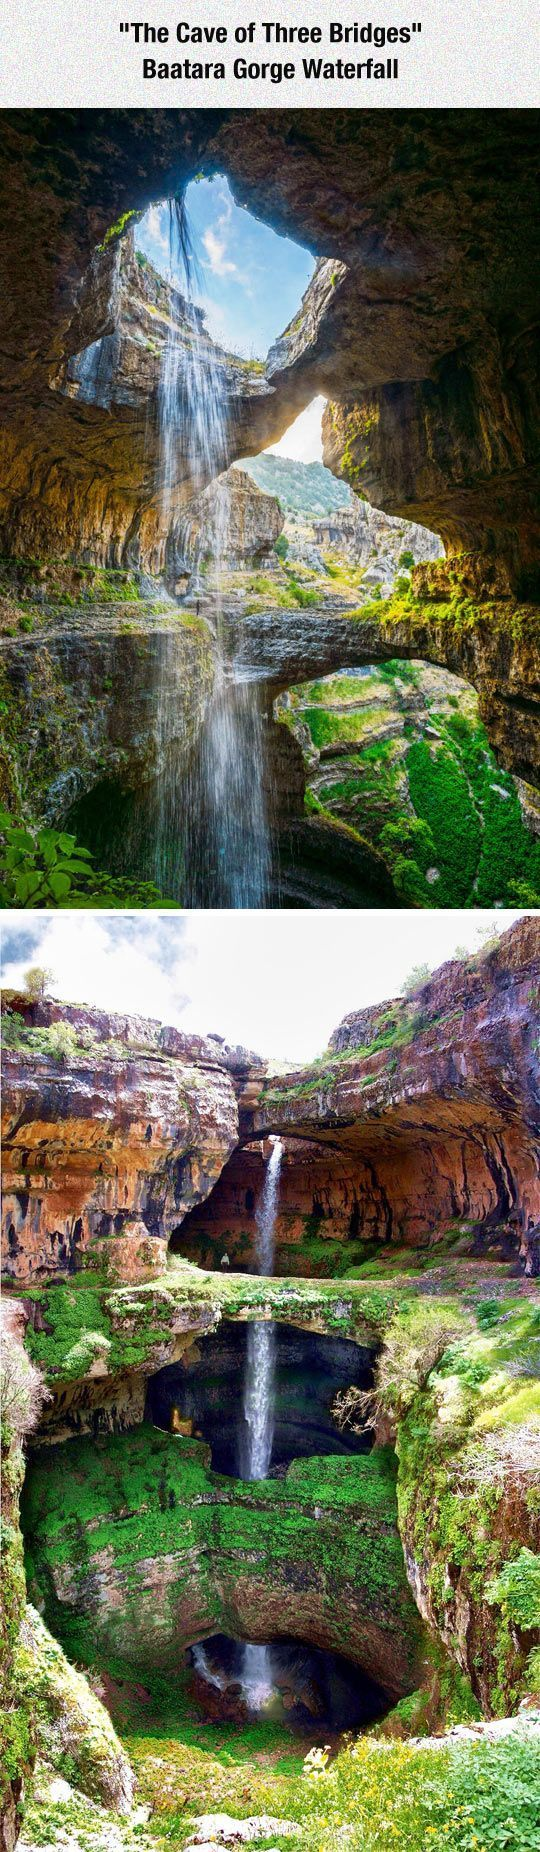 Baatara Gorge Waterfalls, Tannourine, Lebanon (The Cave of the Three Bridges) More At WATERFALLS : FOSTERGINGER @ Pinterest